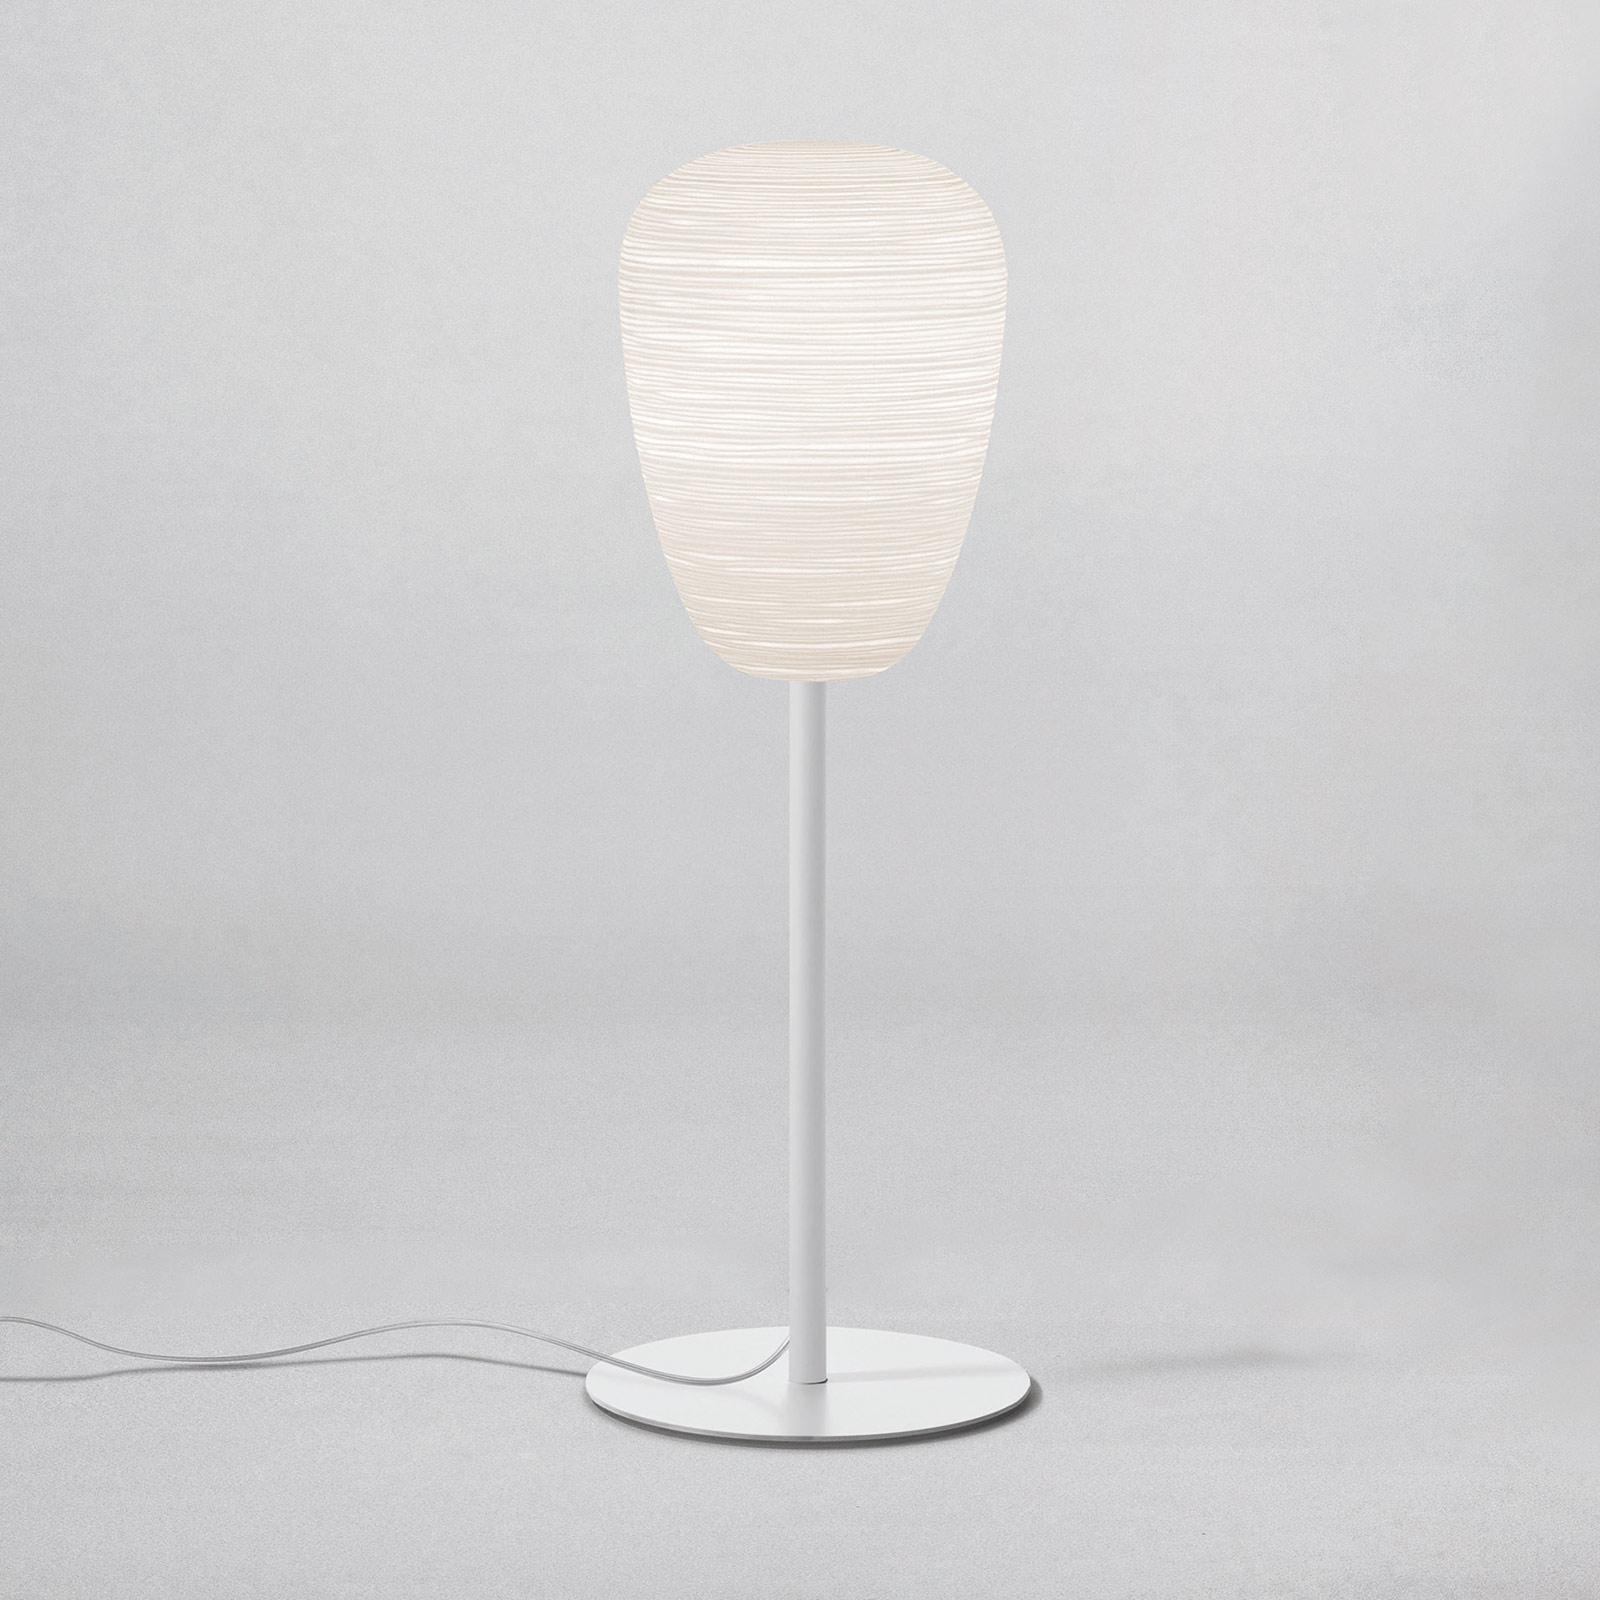 Foscarini Rituals 1 alta bordlampe, hvid